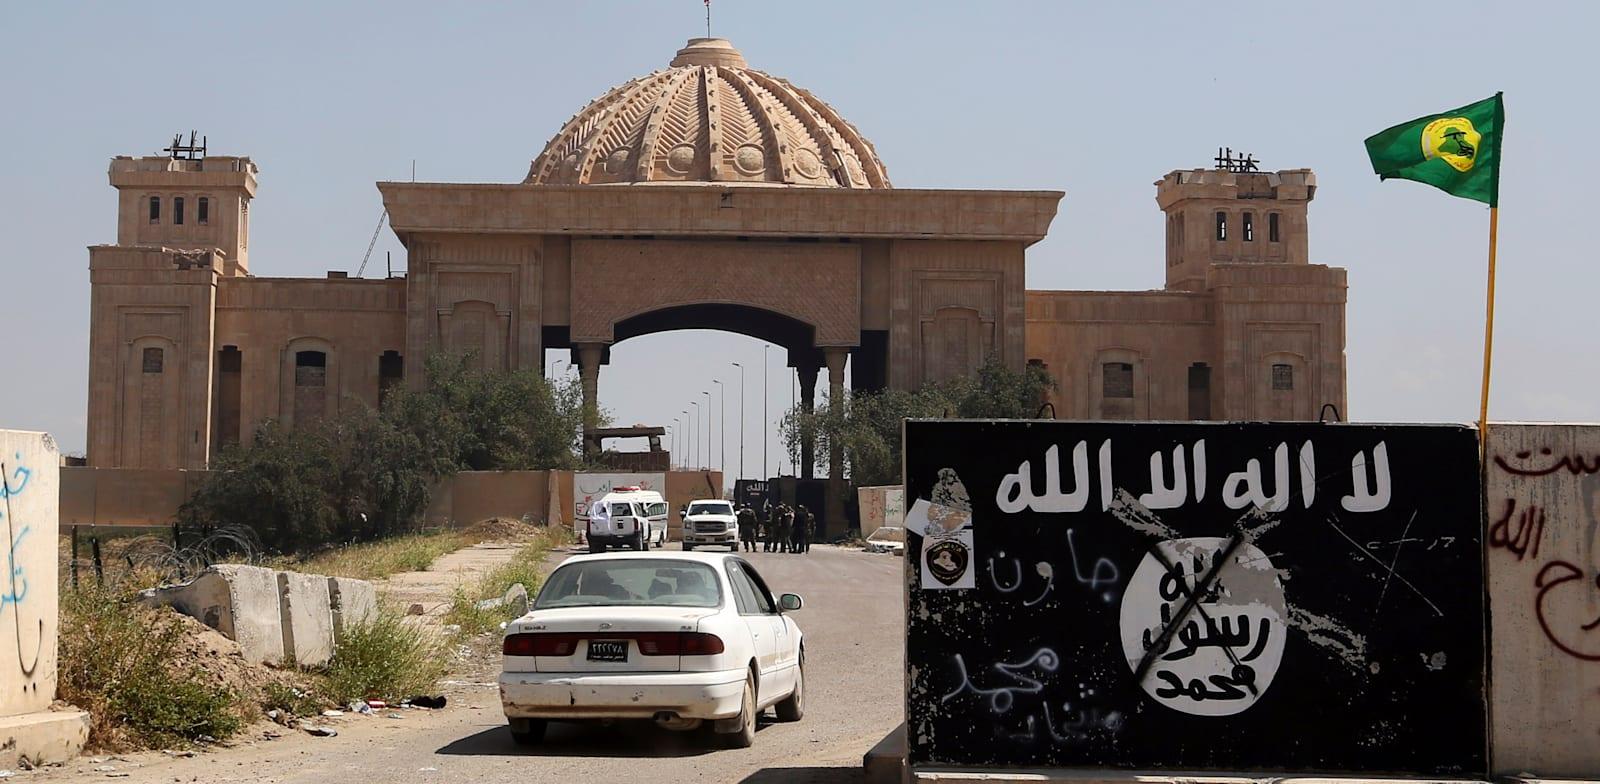 דגל דאעש בתיכרית / צילום: Associated Press, Khalid Mohammed